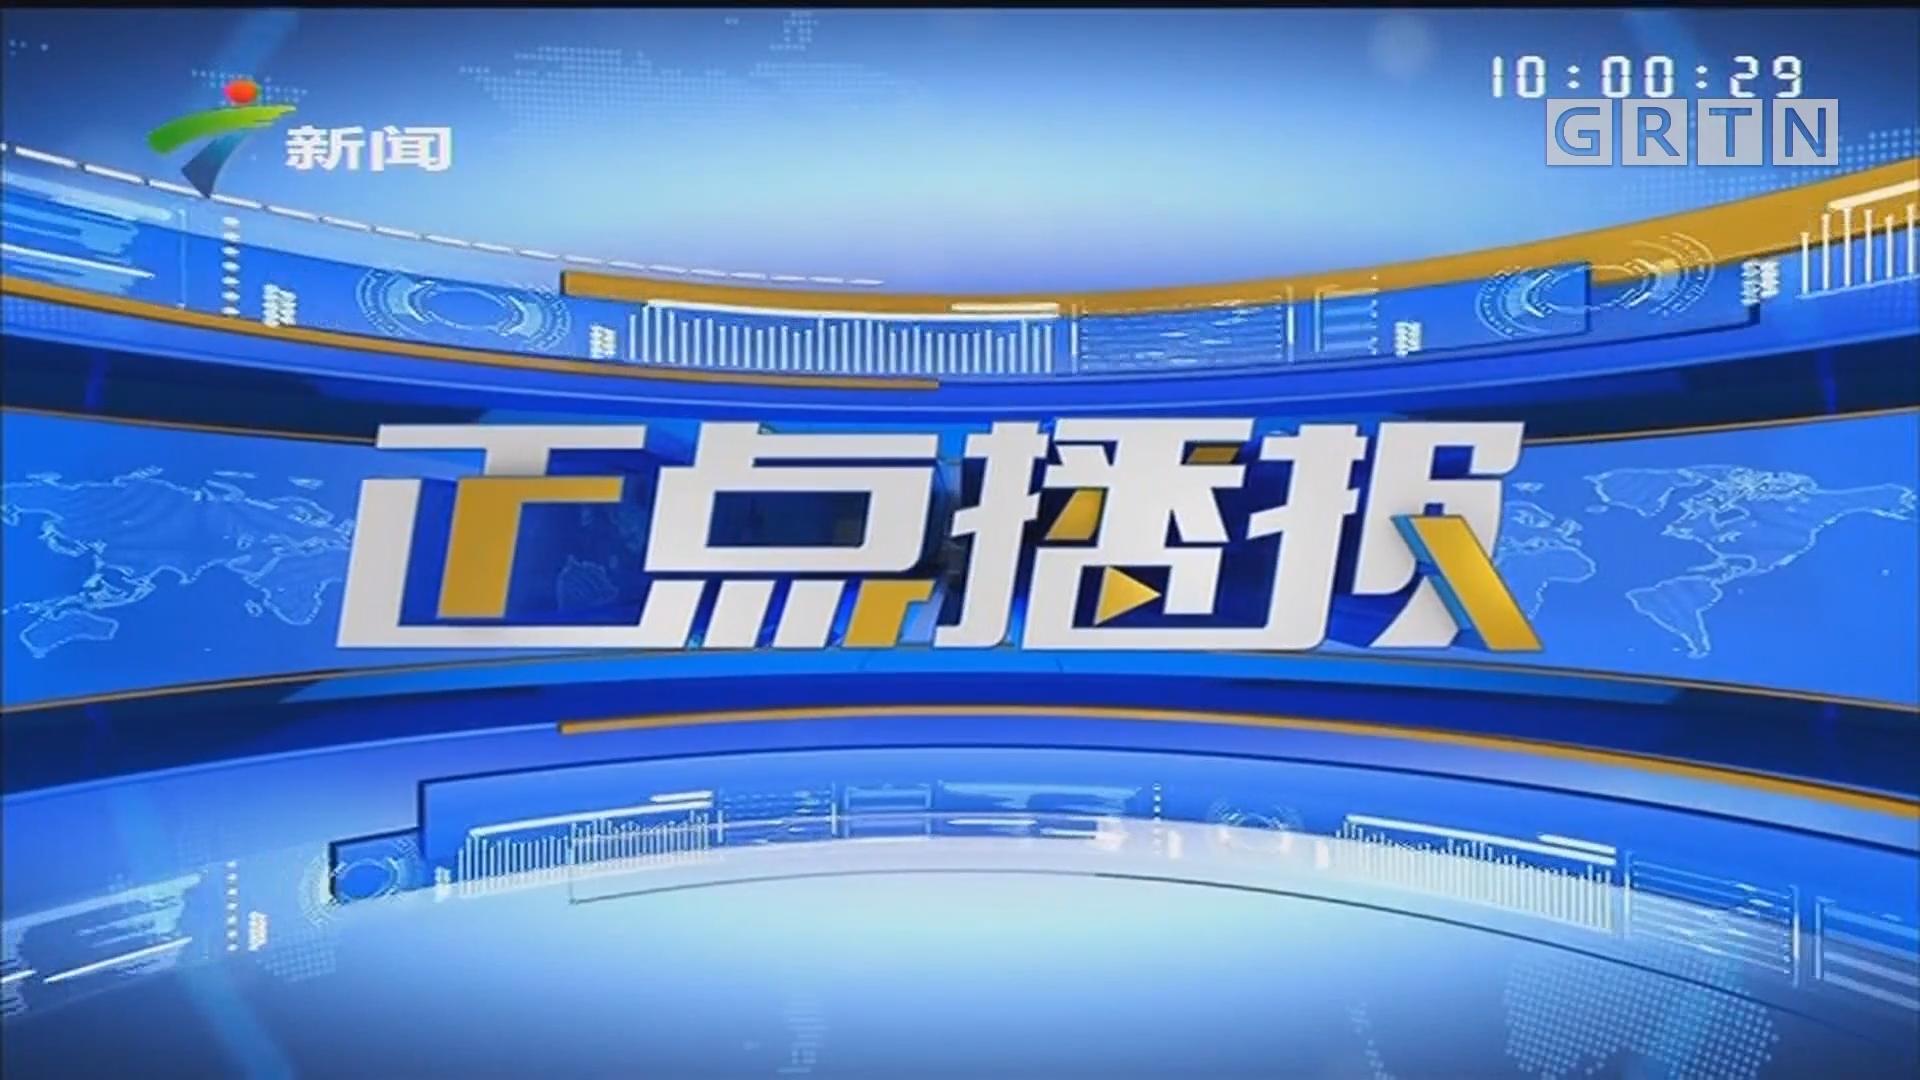 [HD][2019-10-05]正点播报:南粤大地欢庆国庆巡礼:红色景点 美丽乡村受游客青睐